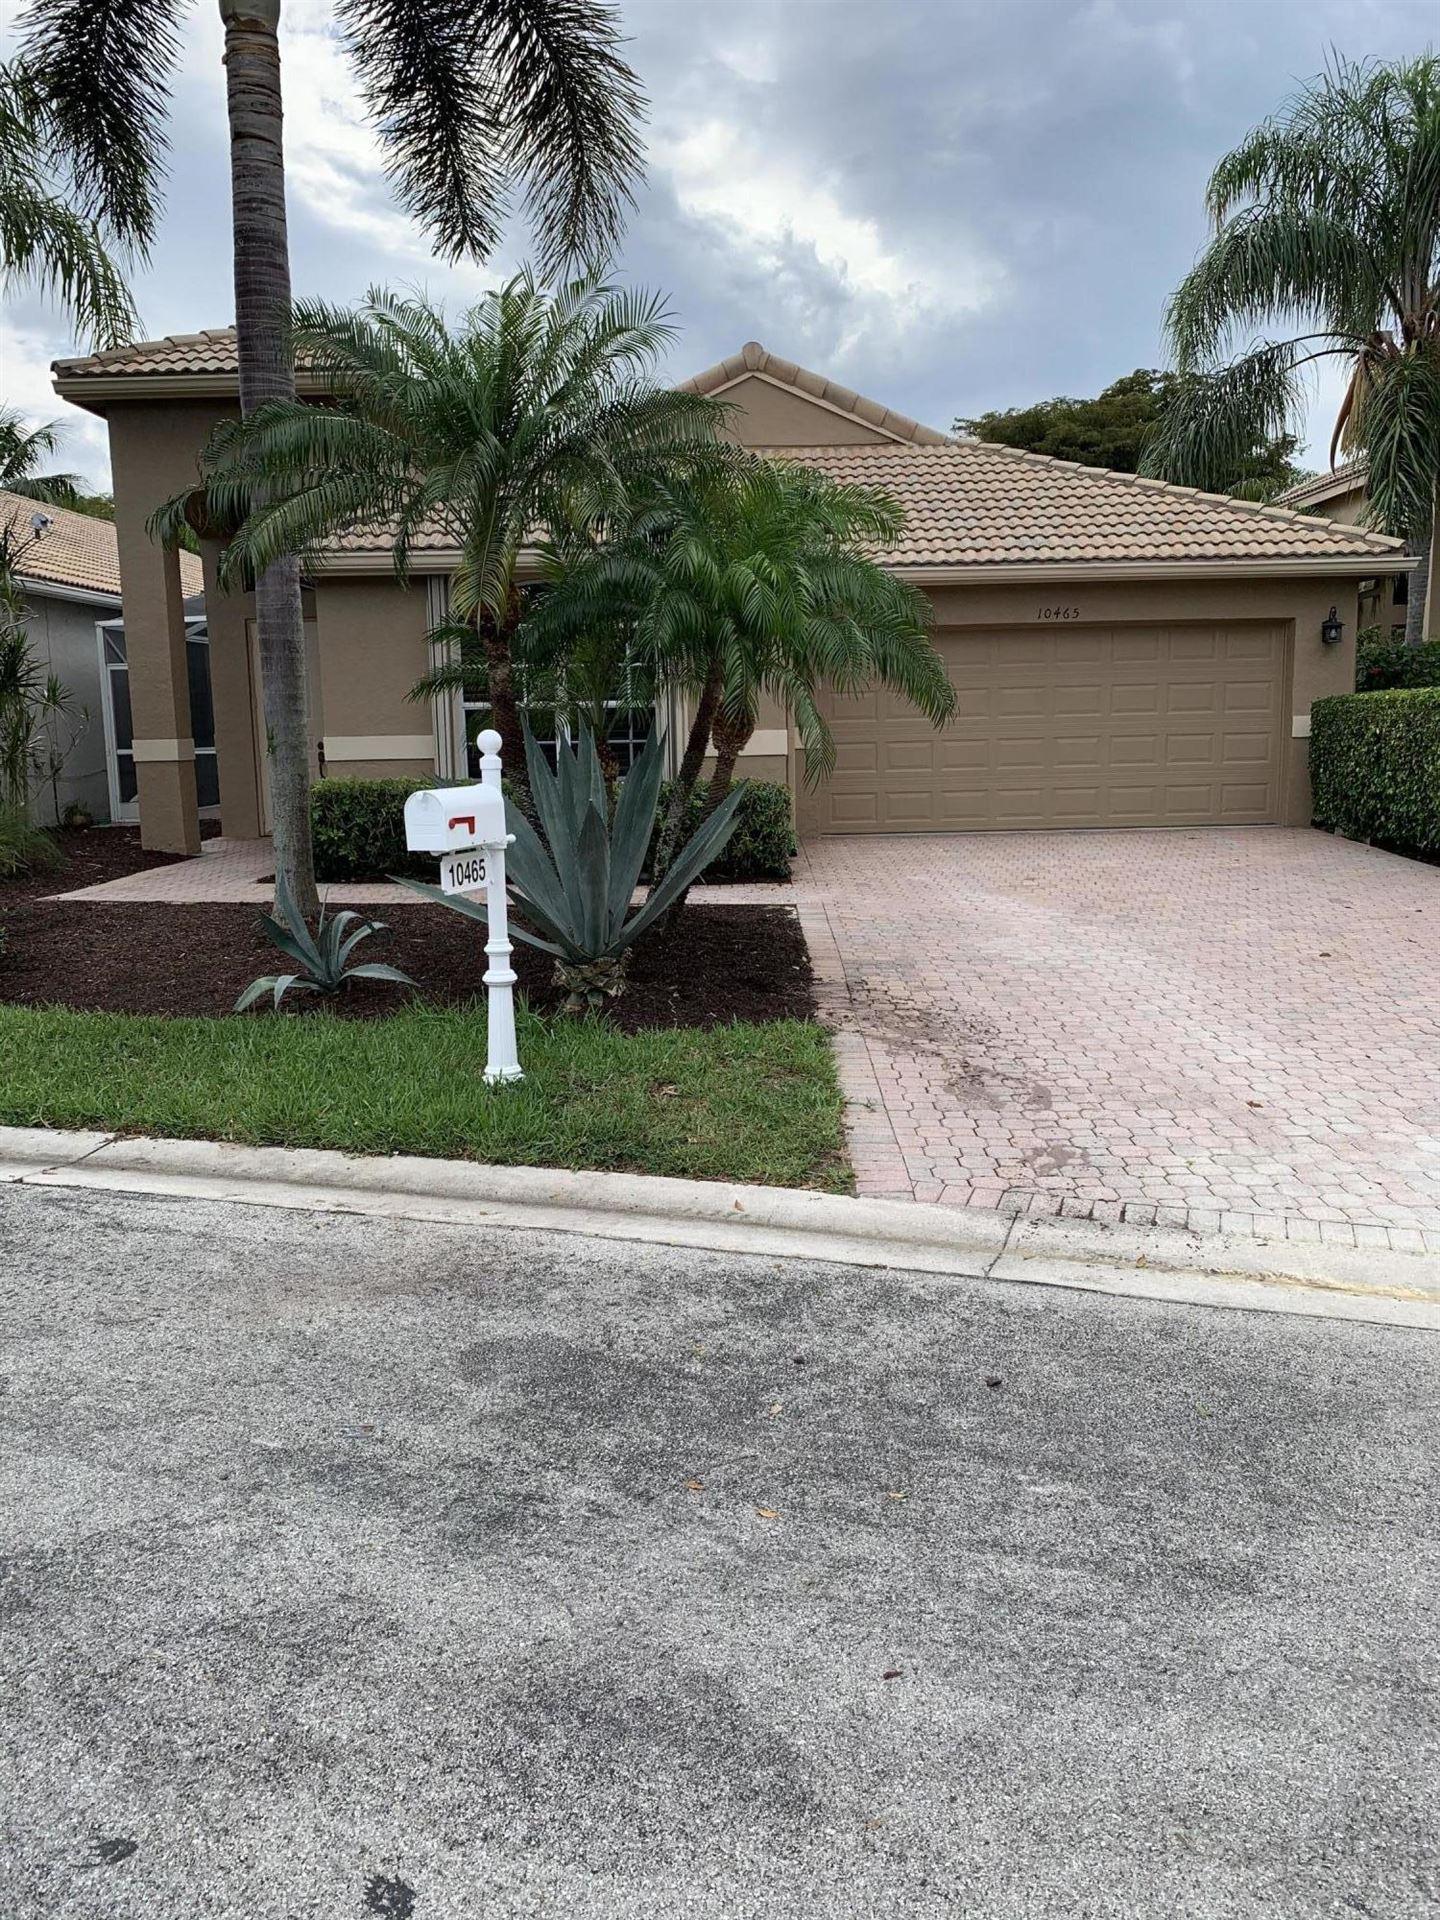 10465 Copper Lake Way, Boynton Beach, FL 33437 - MLS#: RX-10716217